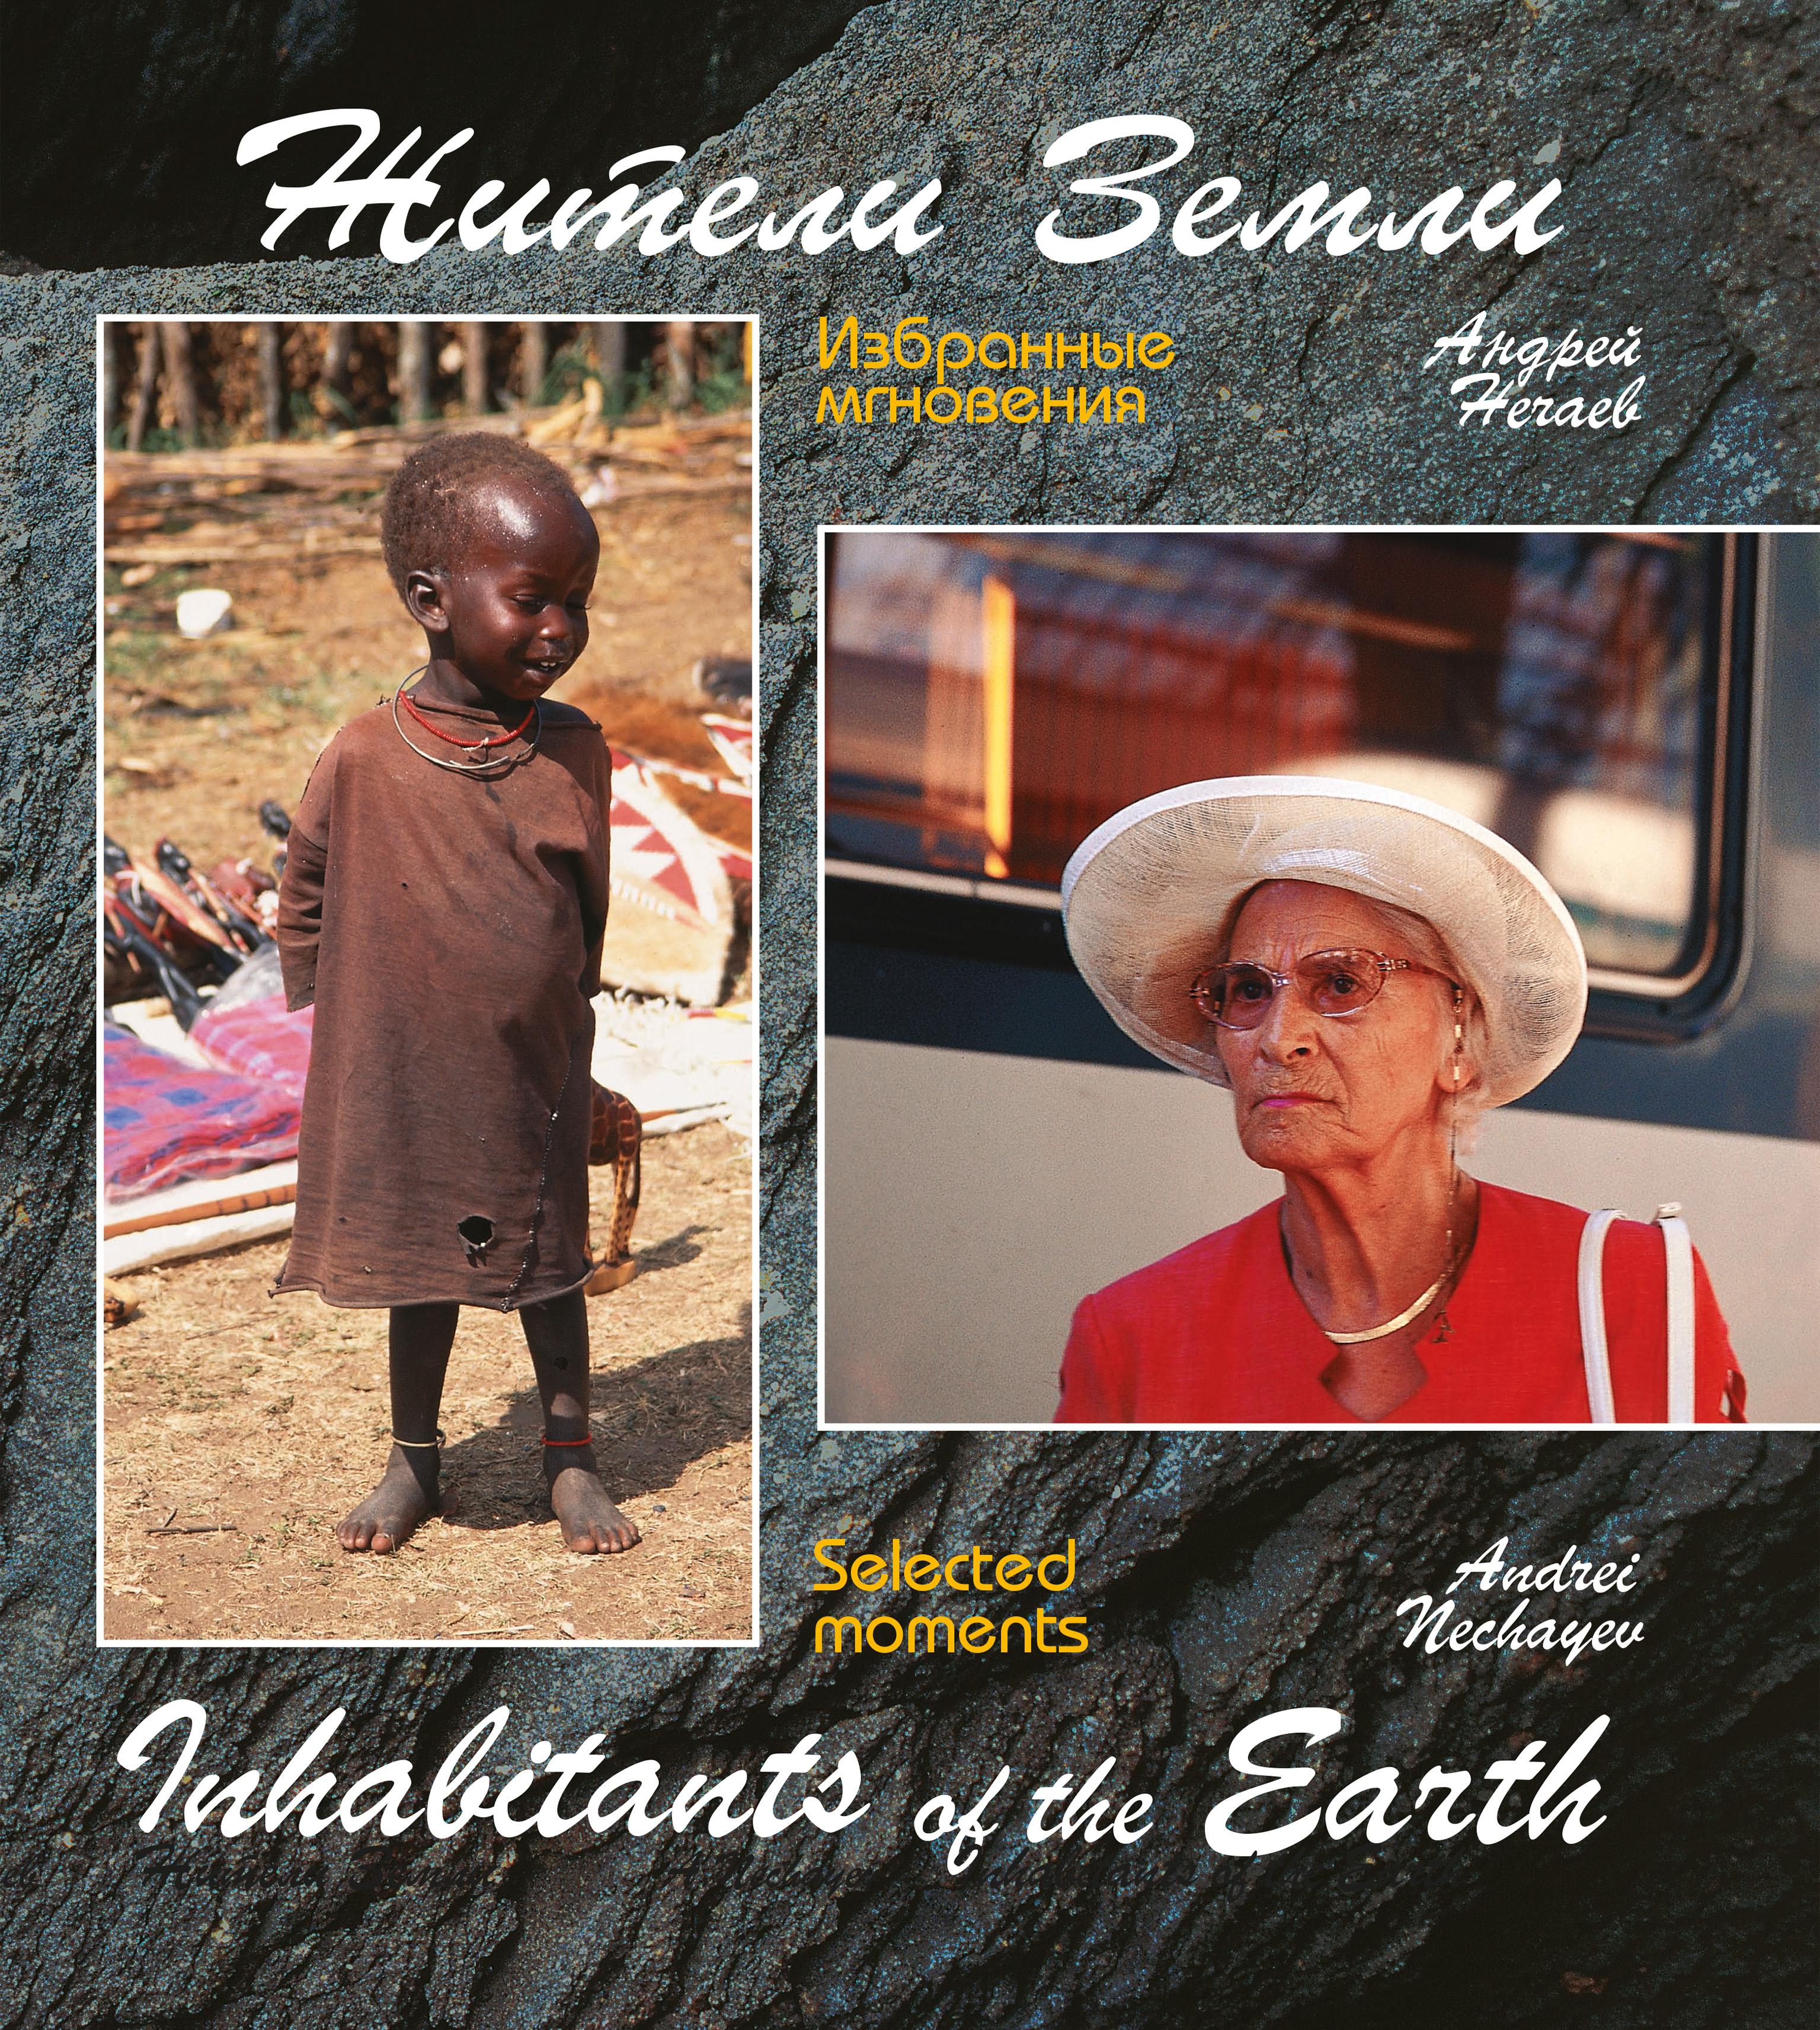 Жители Земли. Избранные мгновения (Inhabitants of the Earth. Selected moments)